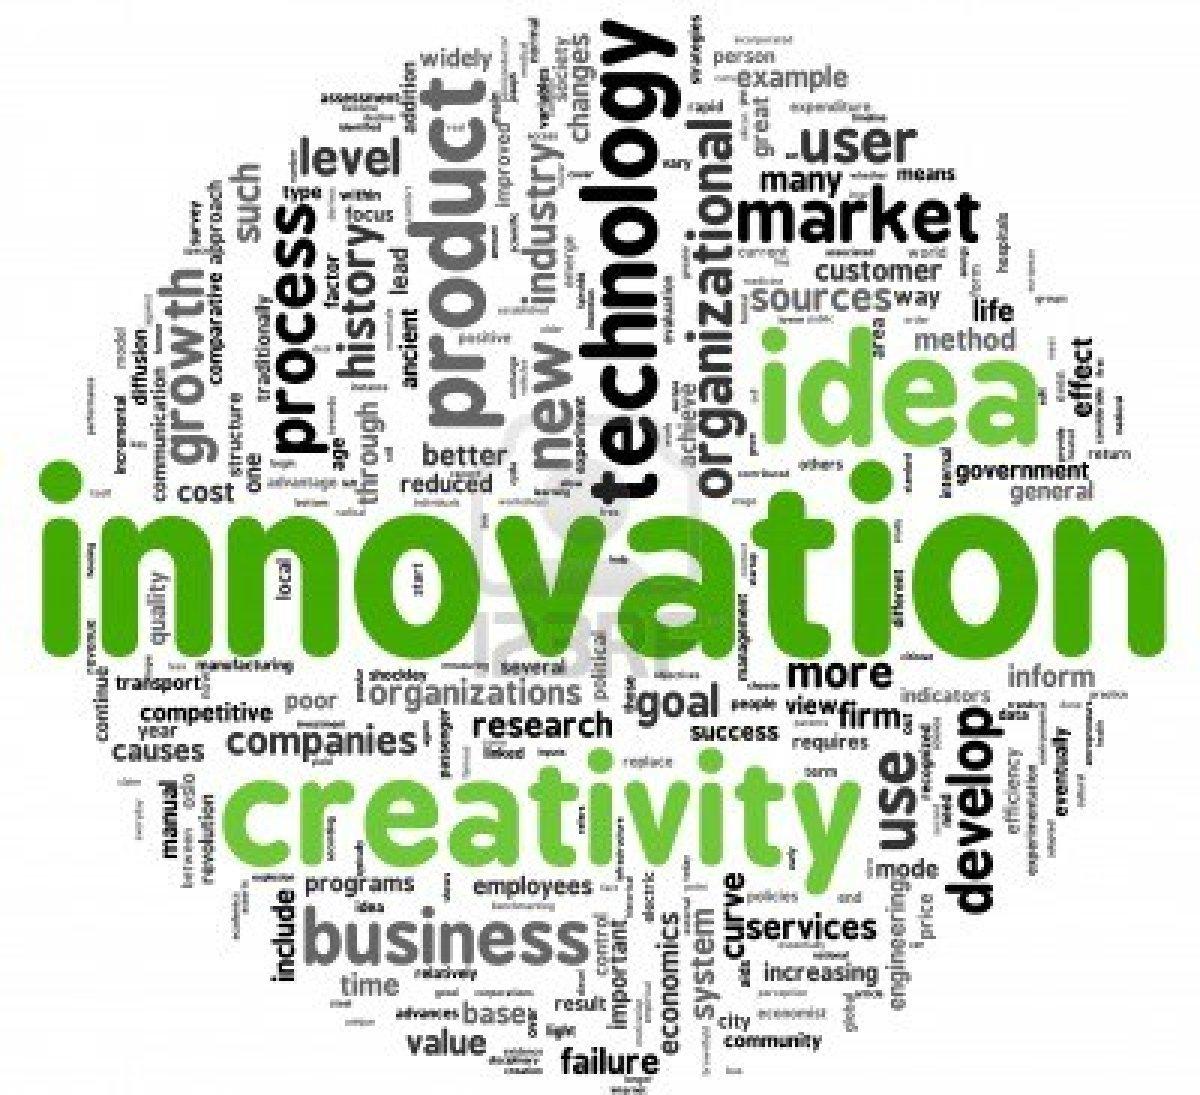 https://i0.wp.com/www.theconnectedclinician.com/wp-content/uploads/2014/08/innovation.jpg